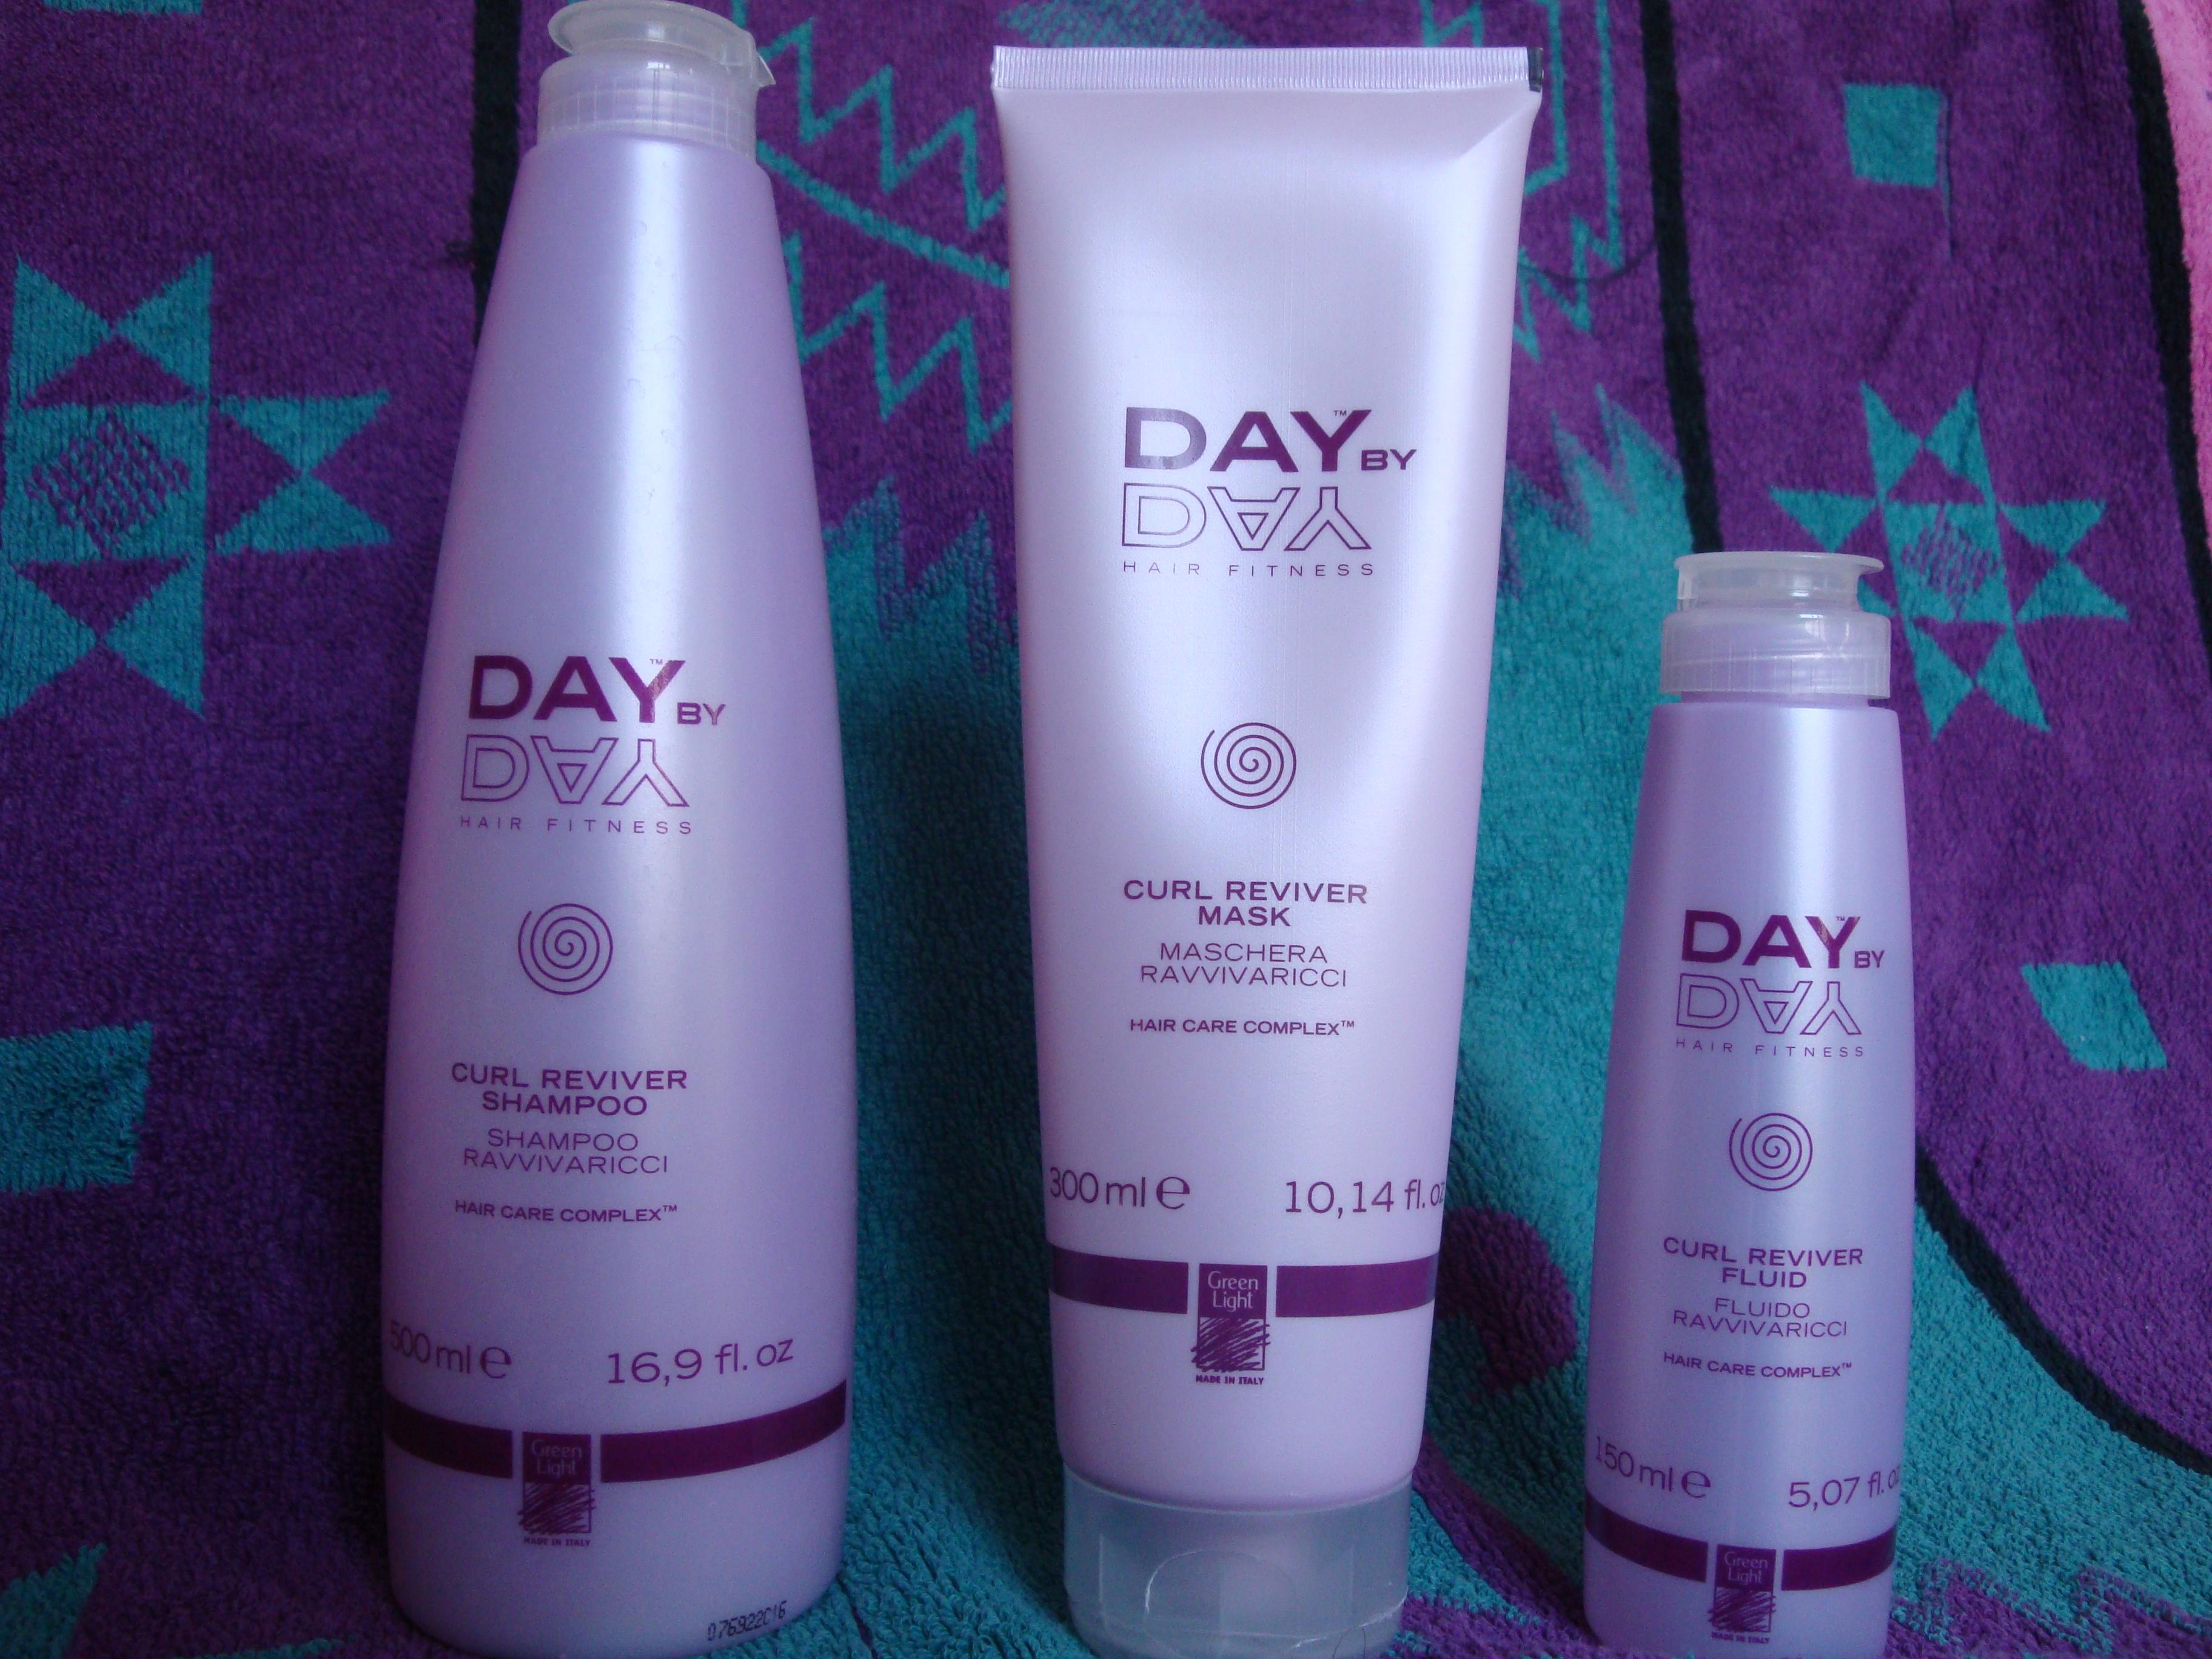 Green light day by day shampoo, crema e fluido ravviva ricci